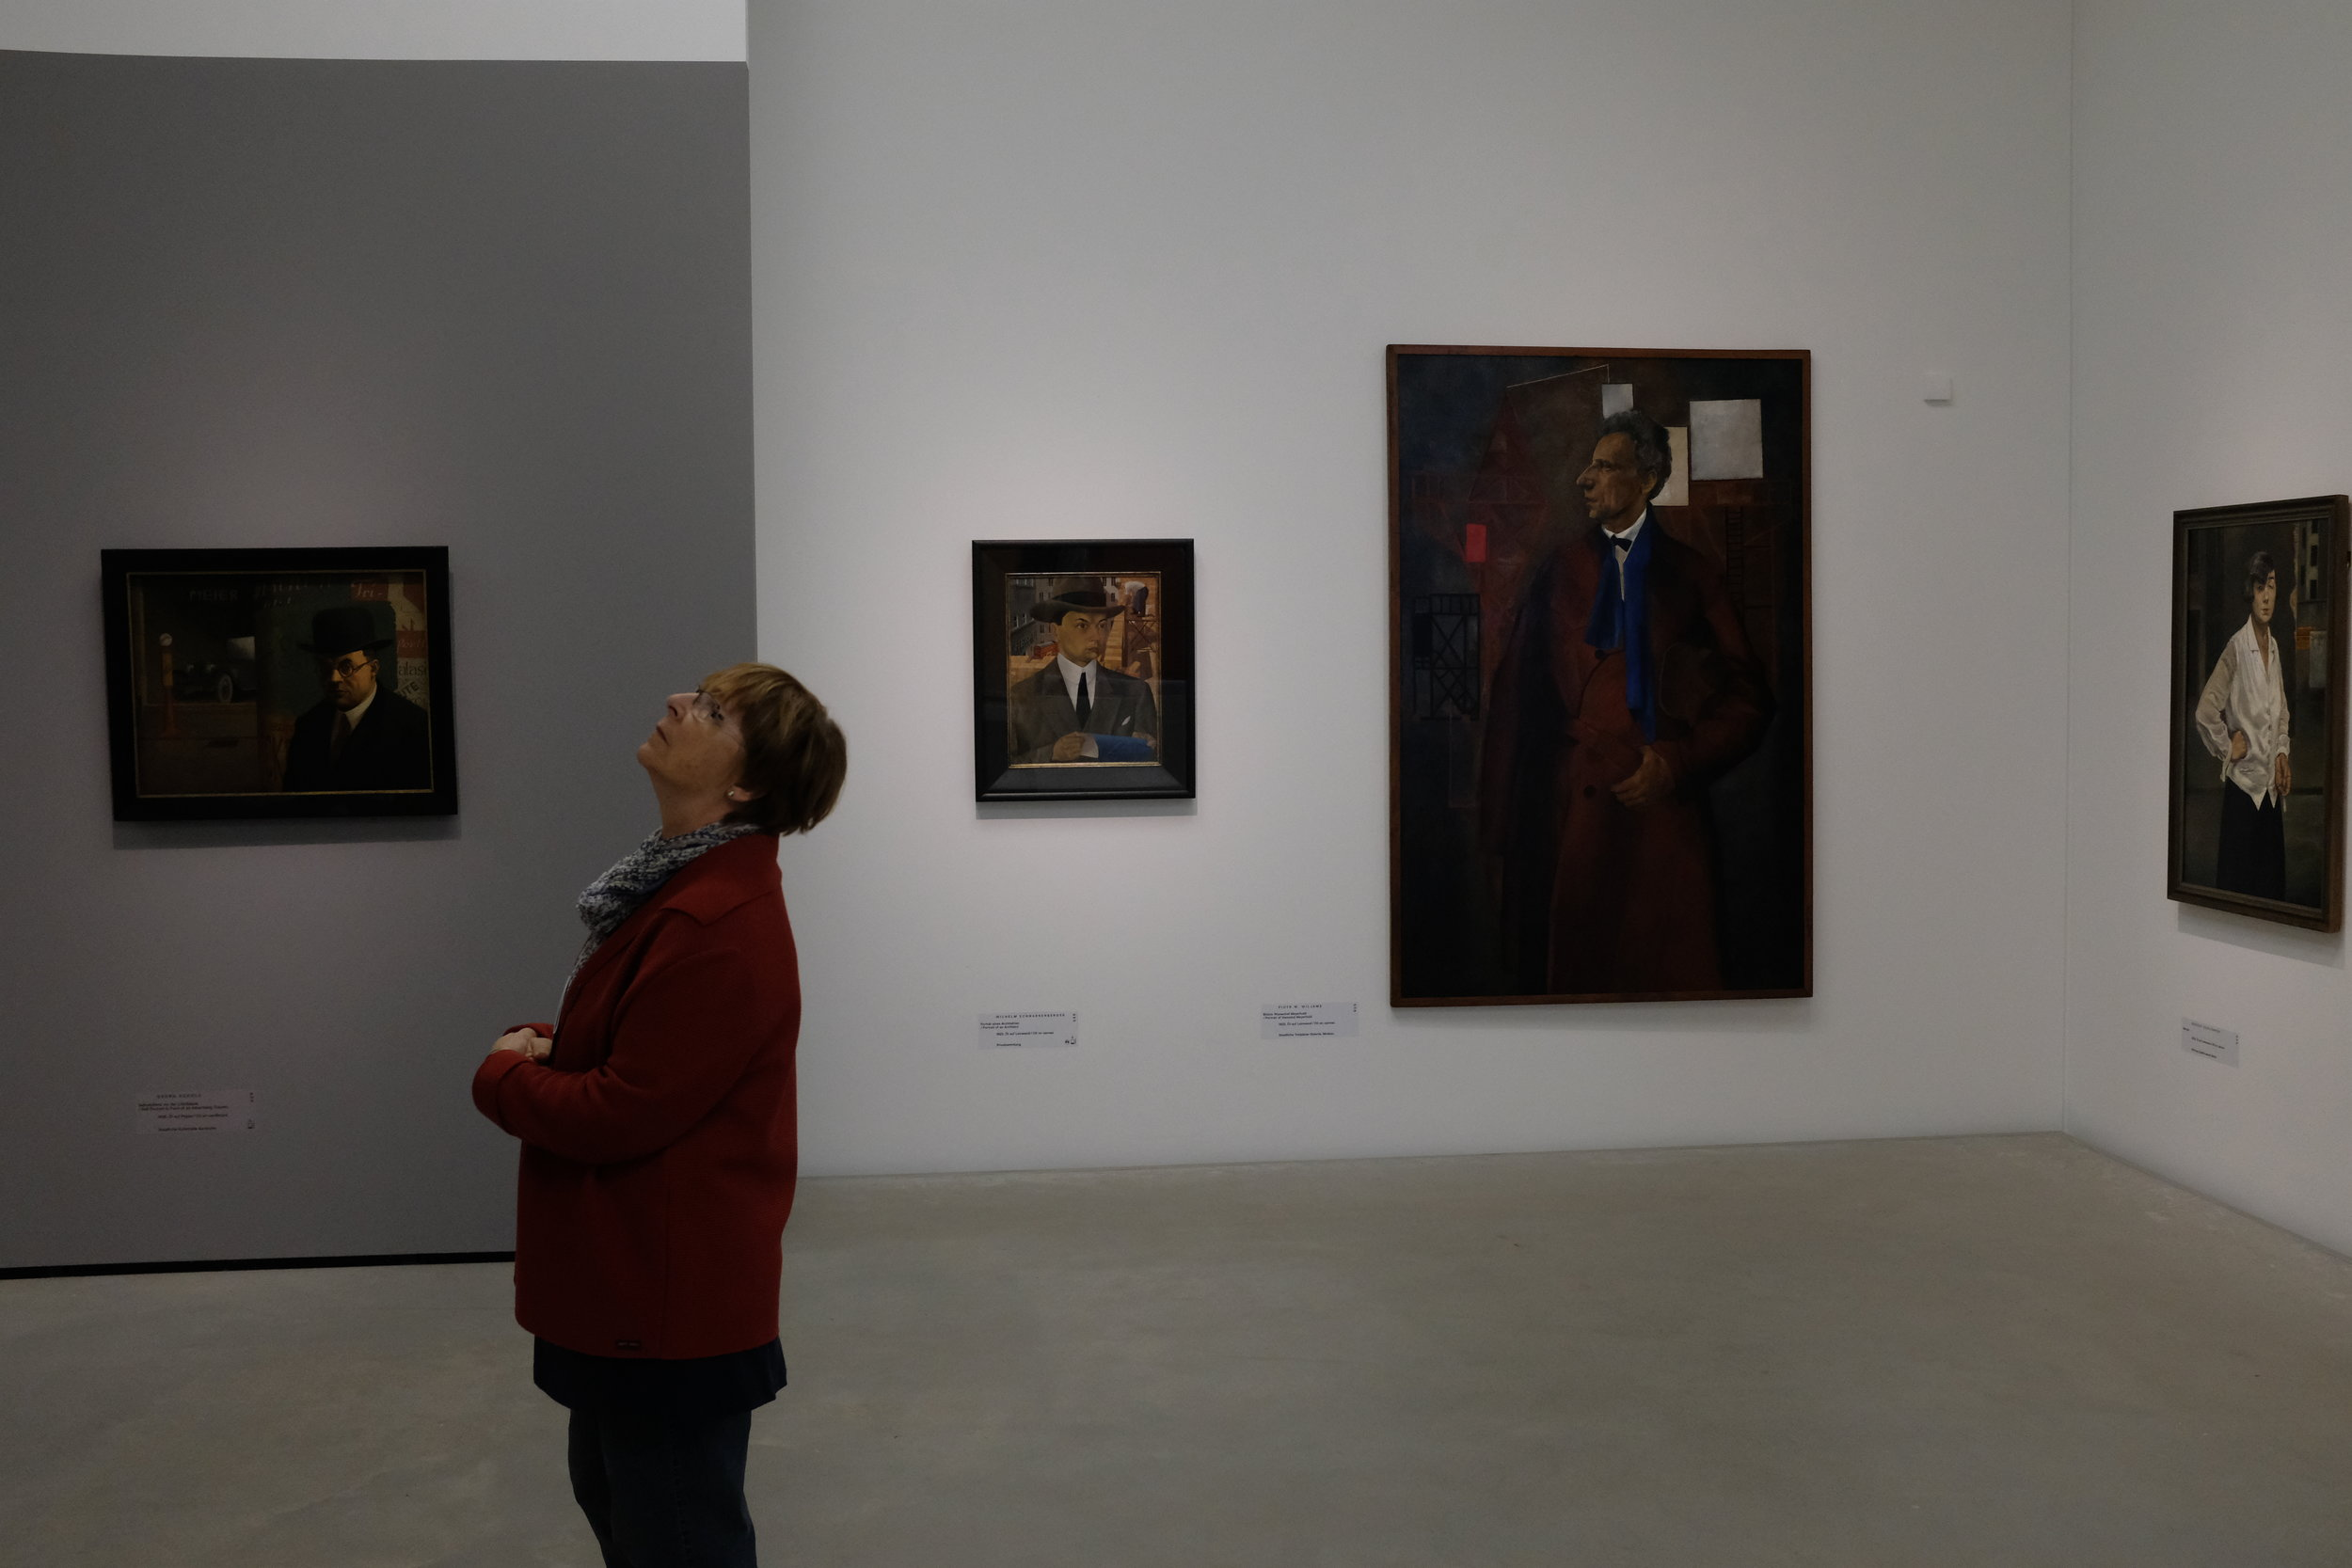 Museum_02.JPG